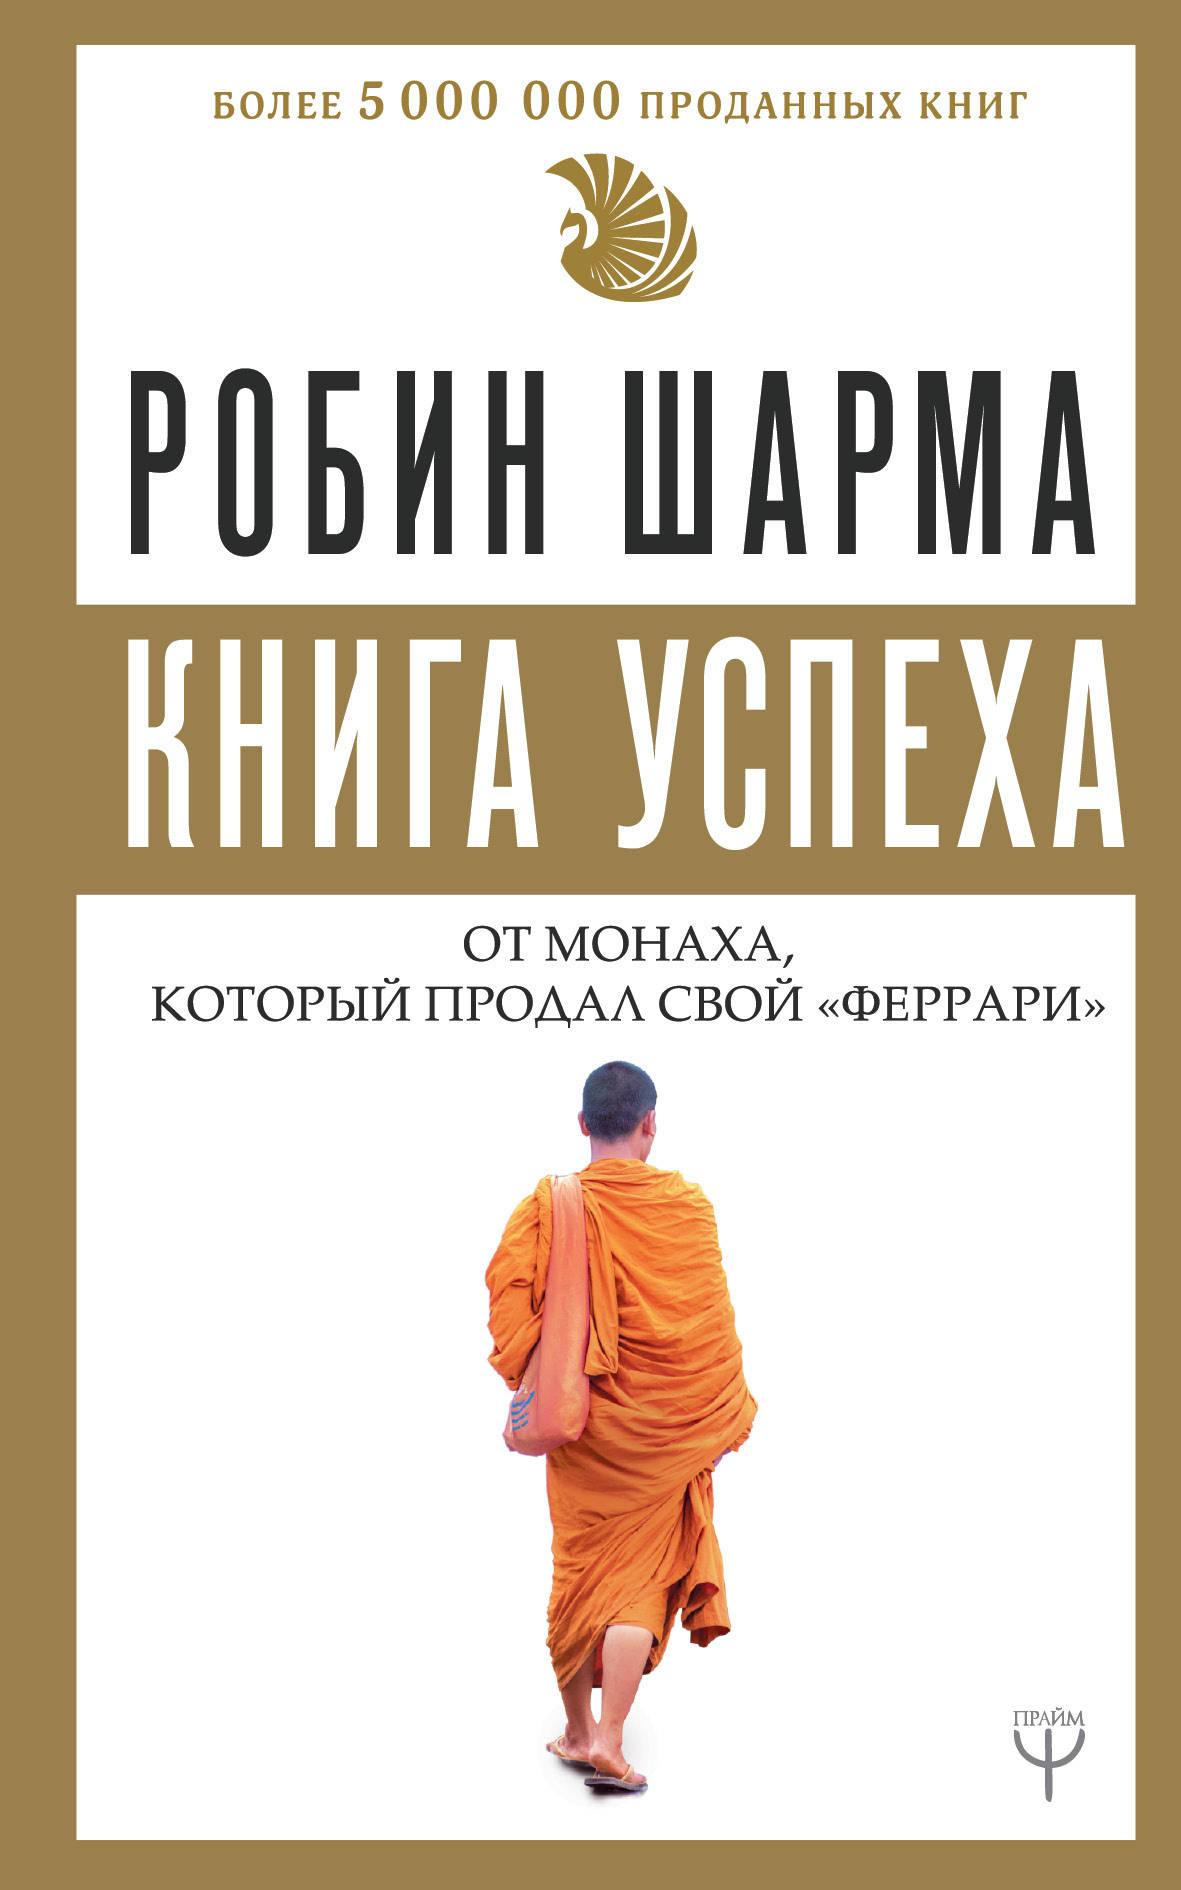 Робин Шарма Книга успеха от монаха, который продал свой «феррари» робин шарма великая книга успеха и счастья от монаха который продал свой феррари сборник